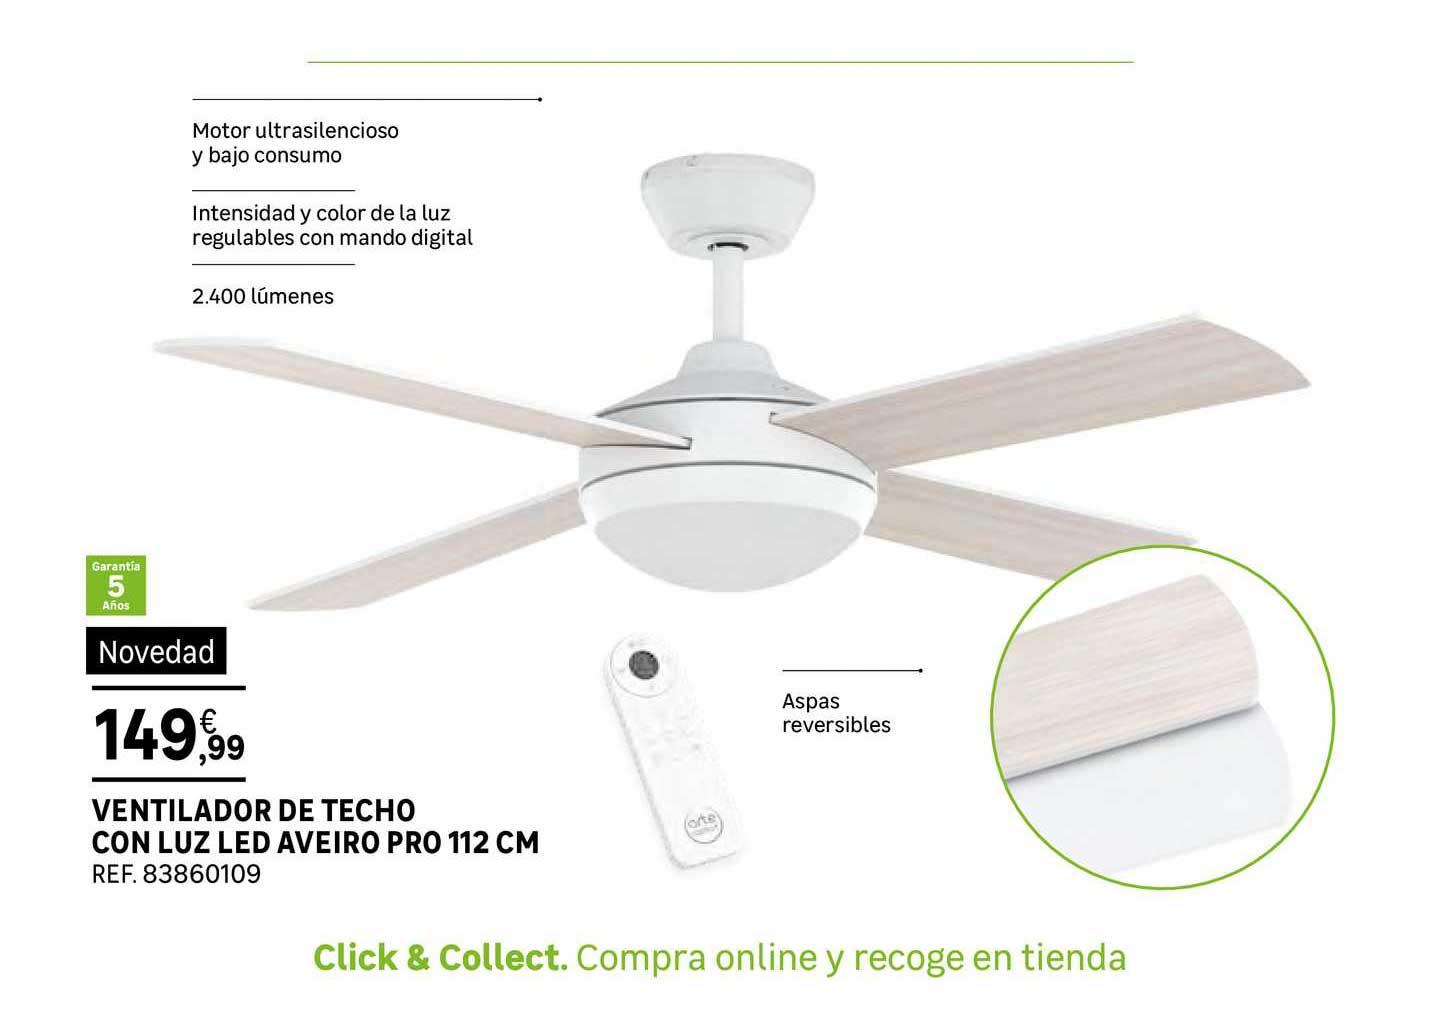 Leroy Merlin Ventilador De Techo Con Luz Led Aveiro Pro 112cm